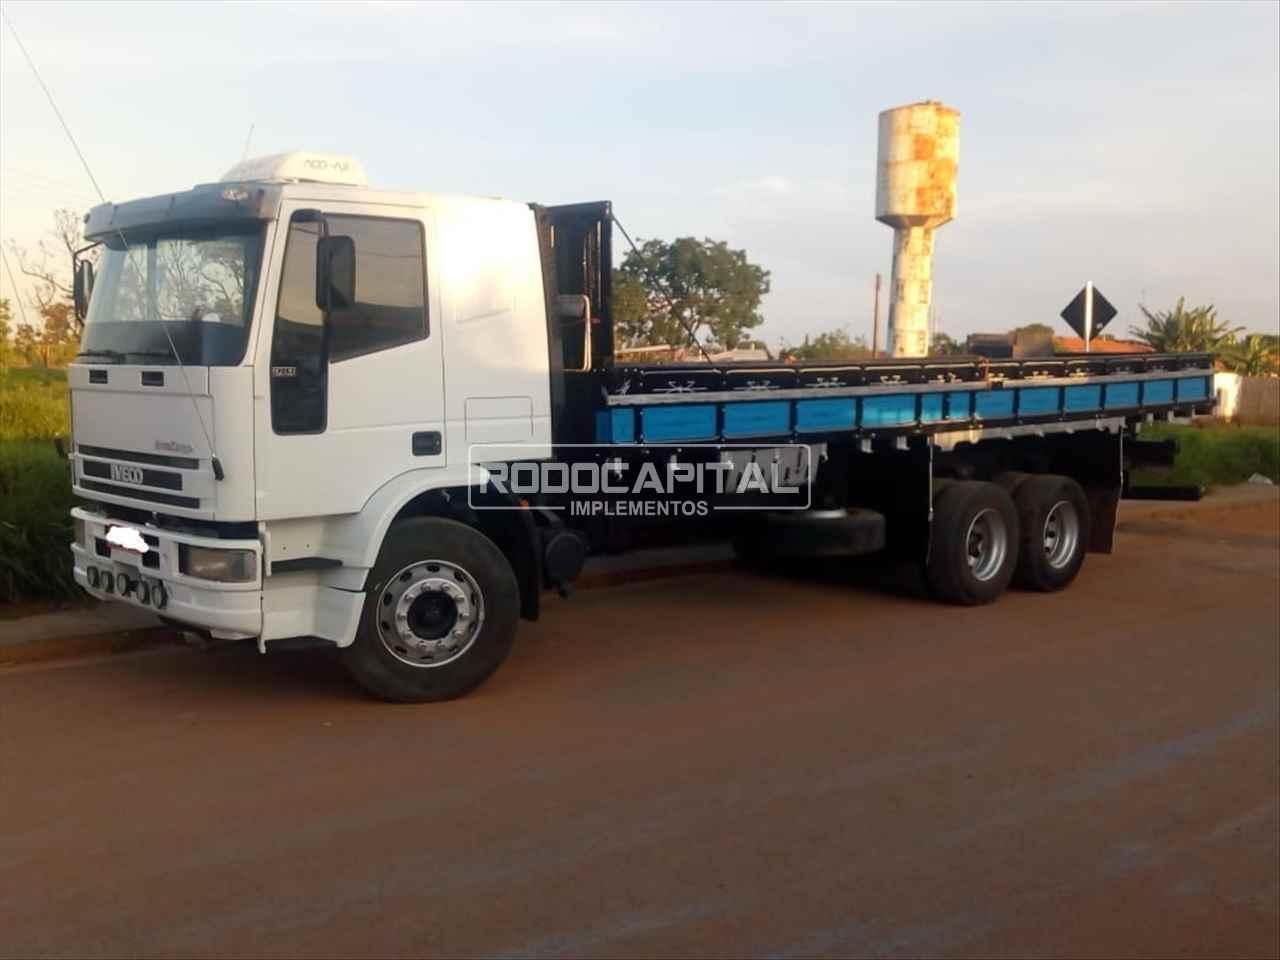 CAMINHAO IVECO EUROCARGO 230E24 Carga Seca Truck 6x2 RODOCAPITAL - TRUCKVAN BRASILIA DISTRITO FEDERAL DF